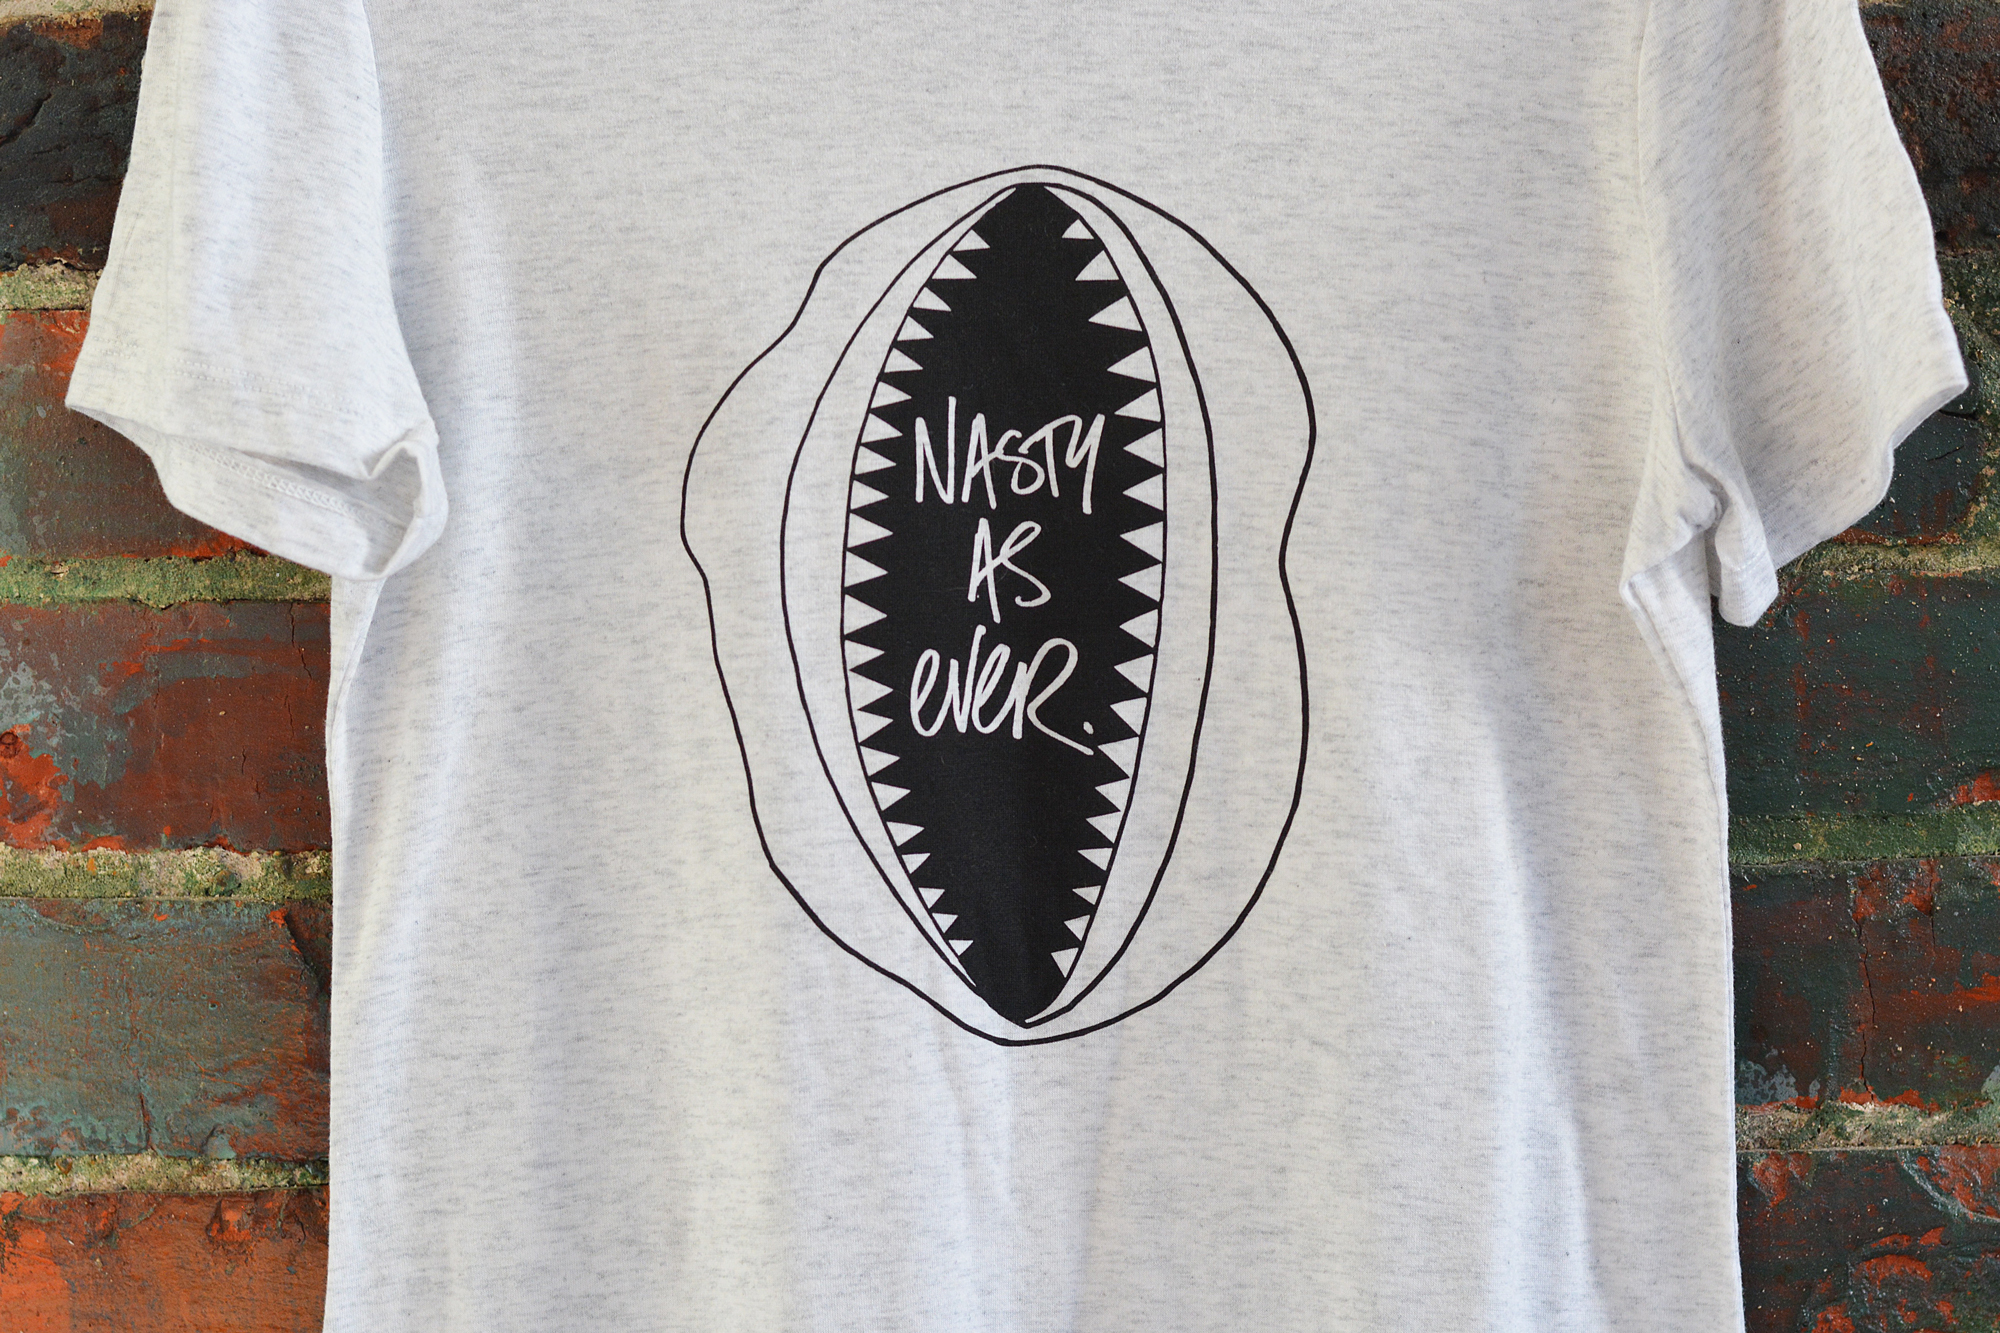 nasty-as-ever-shirt-2_2000x1333.jpg